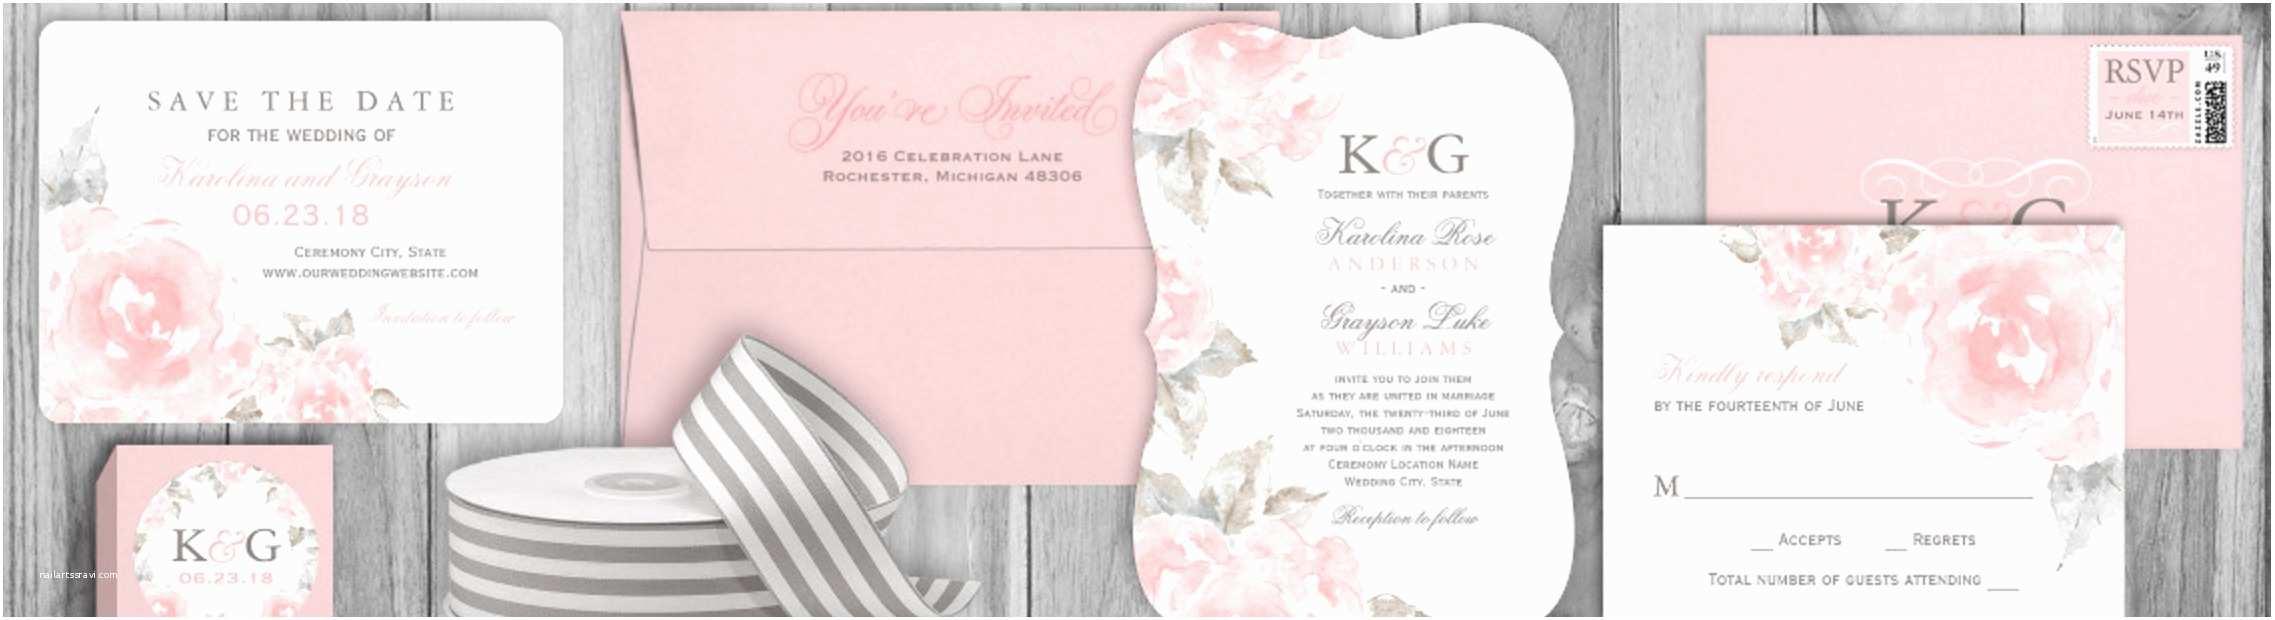 Pink and Gray Wedding Invitations Pink Rose Wedding Invitations